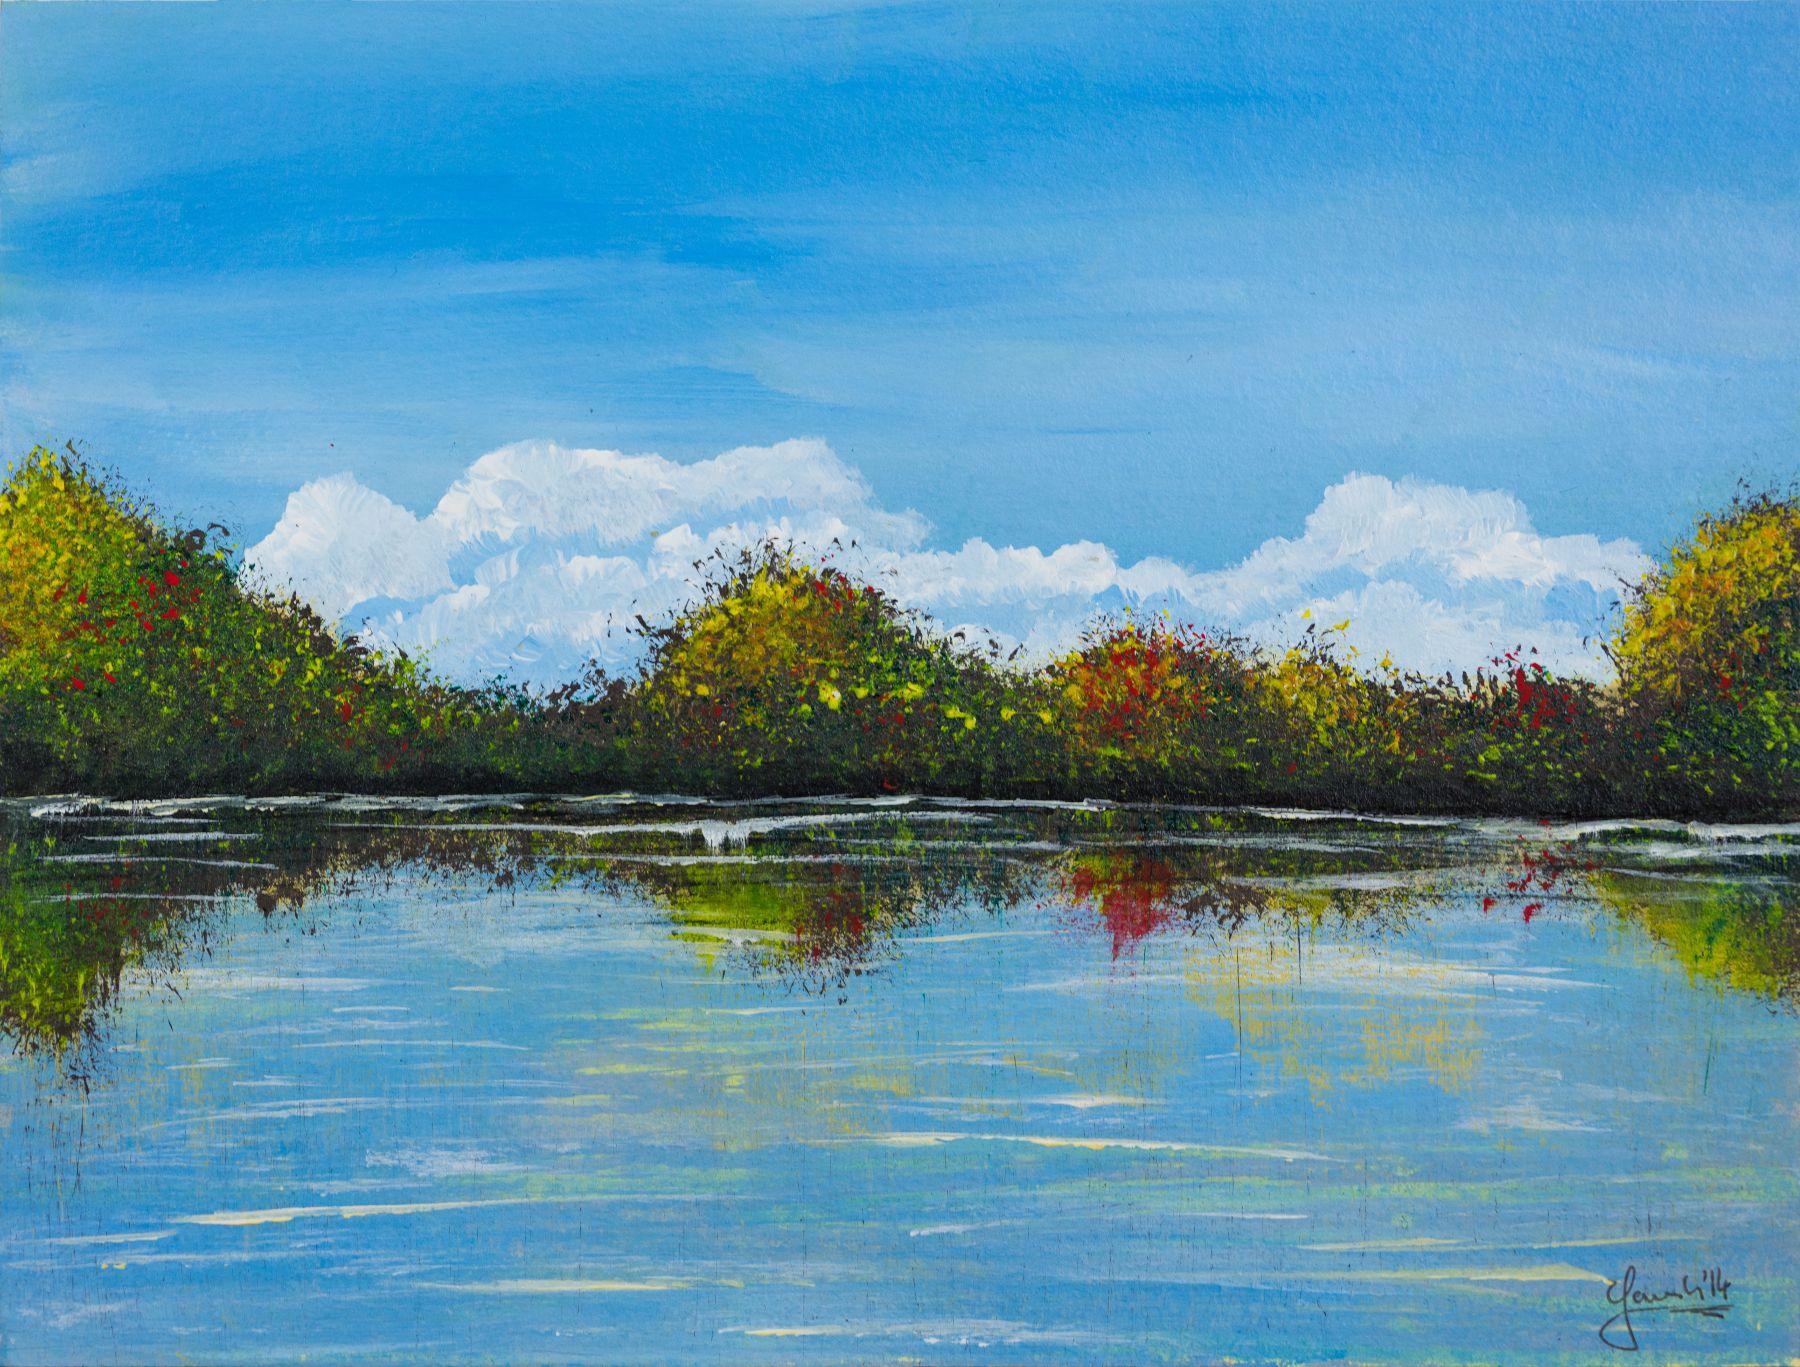 Shoreland, 32 x 24 cm, Acryl & Öl, 2014